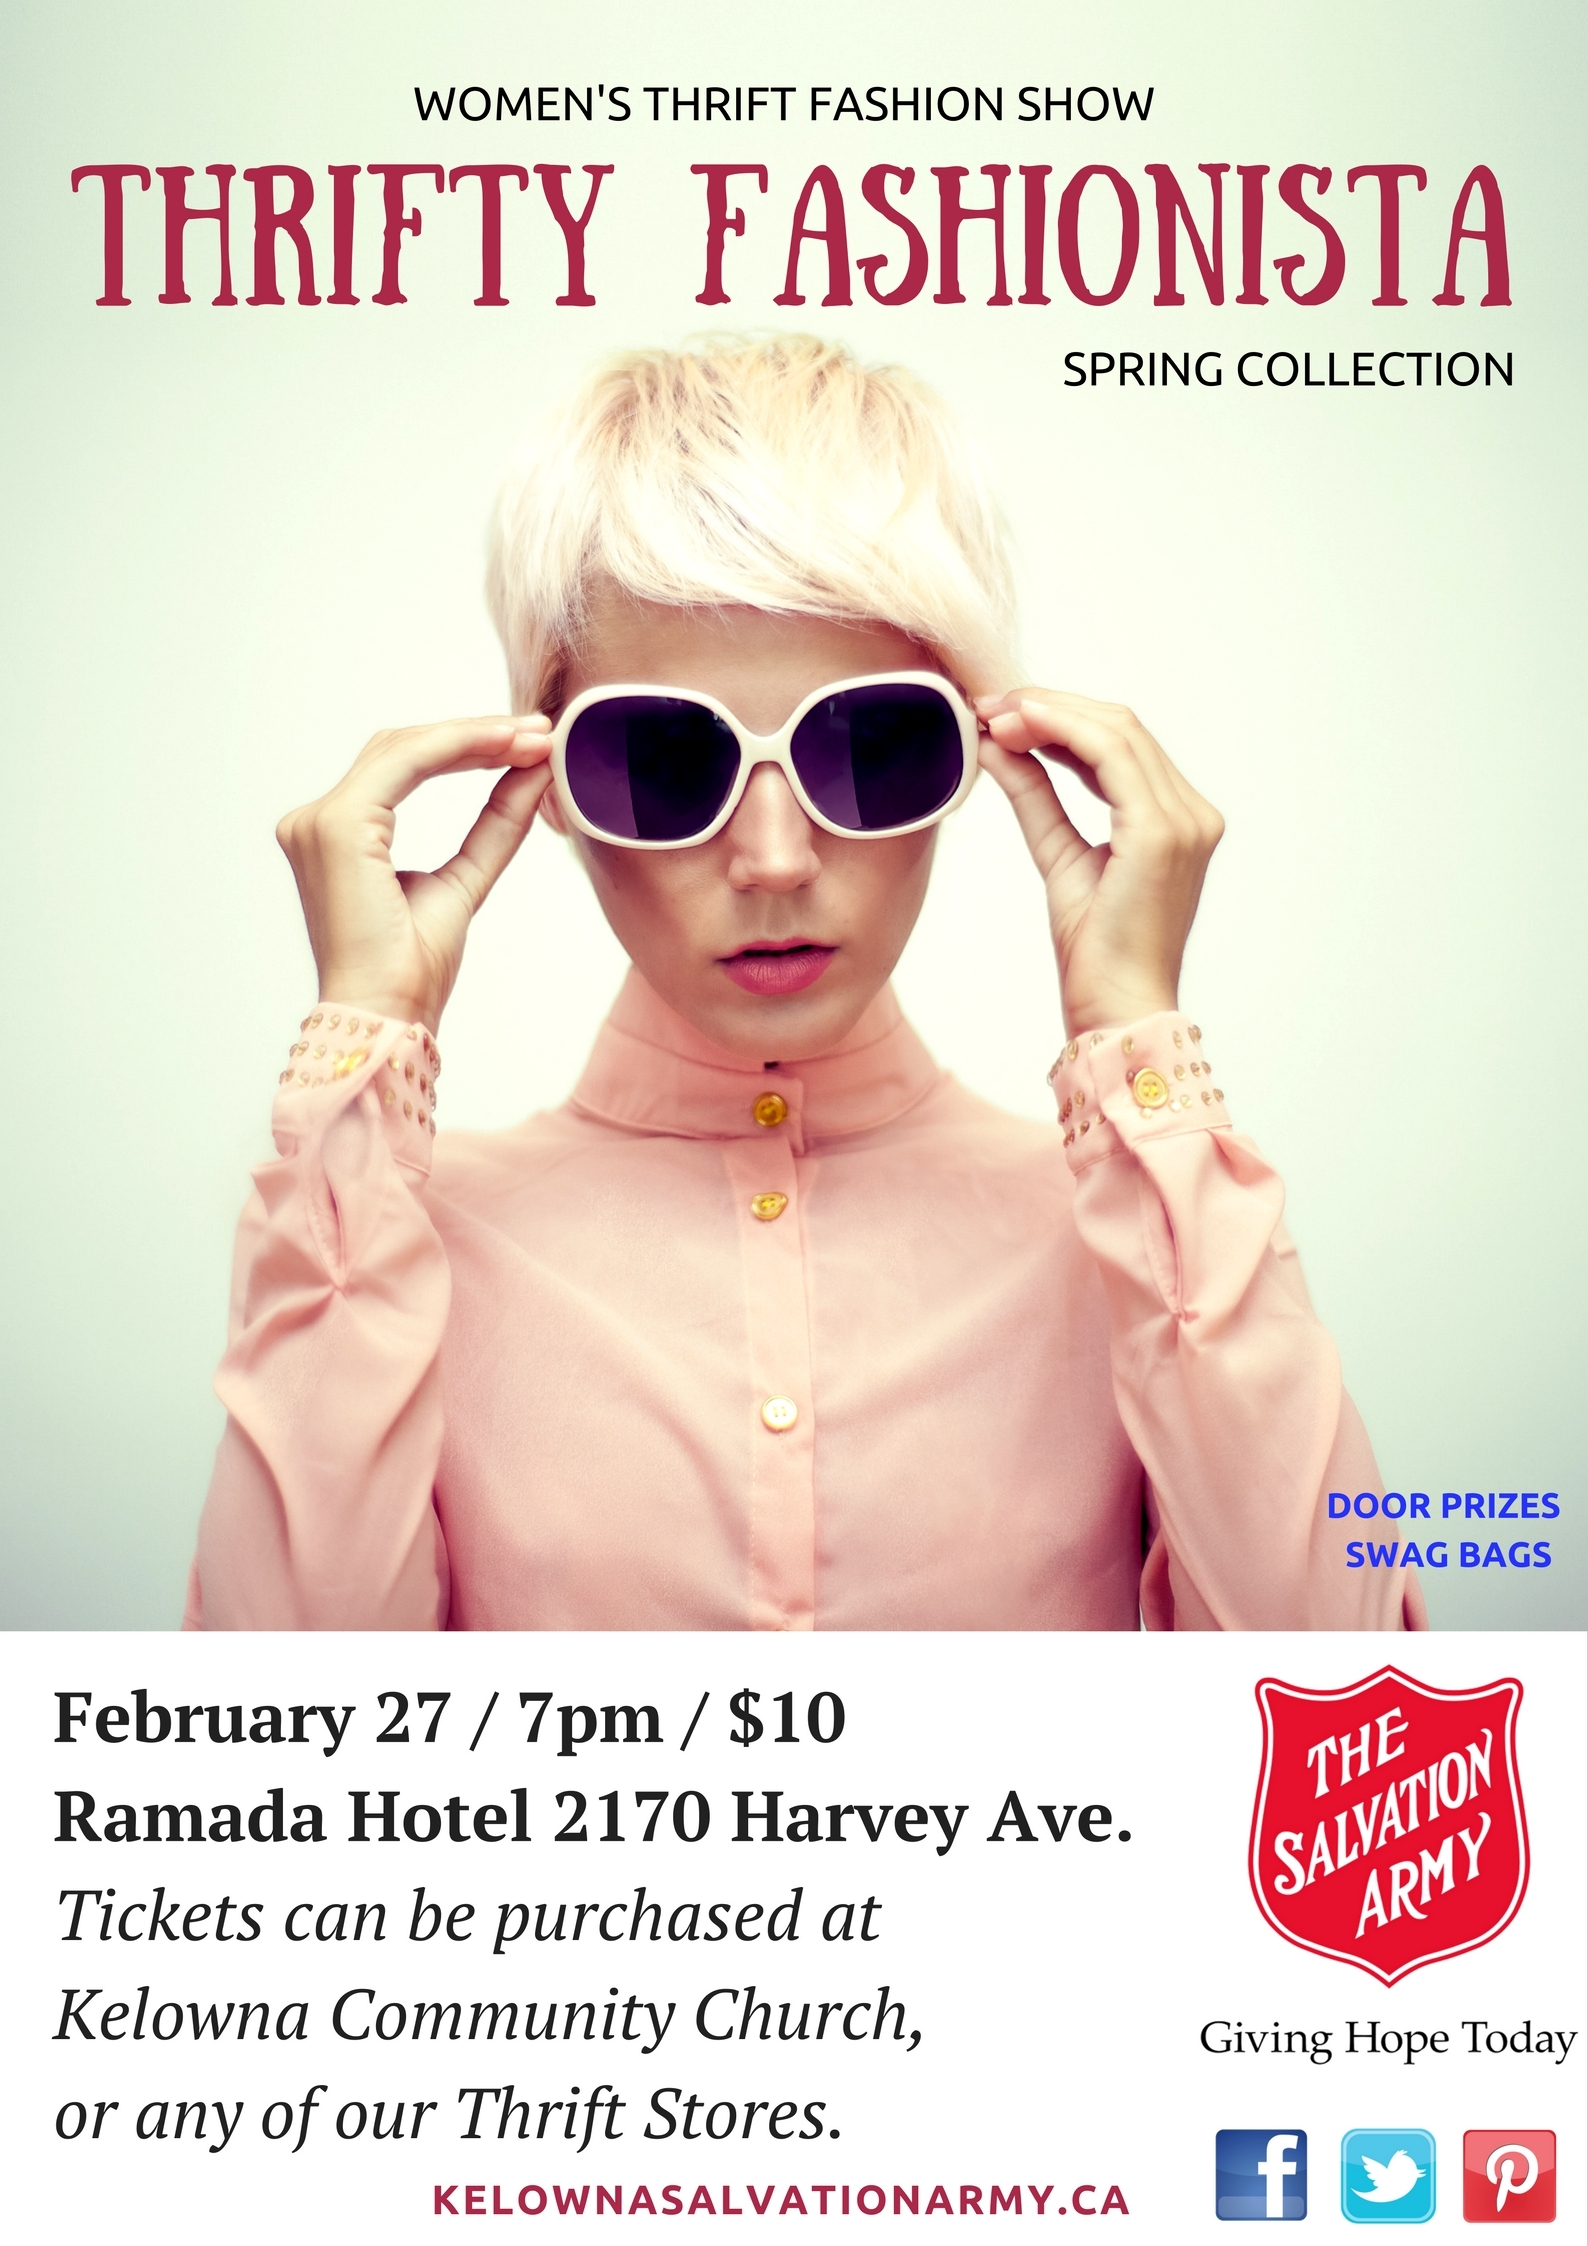 Salvation Army Fashion Show